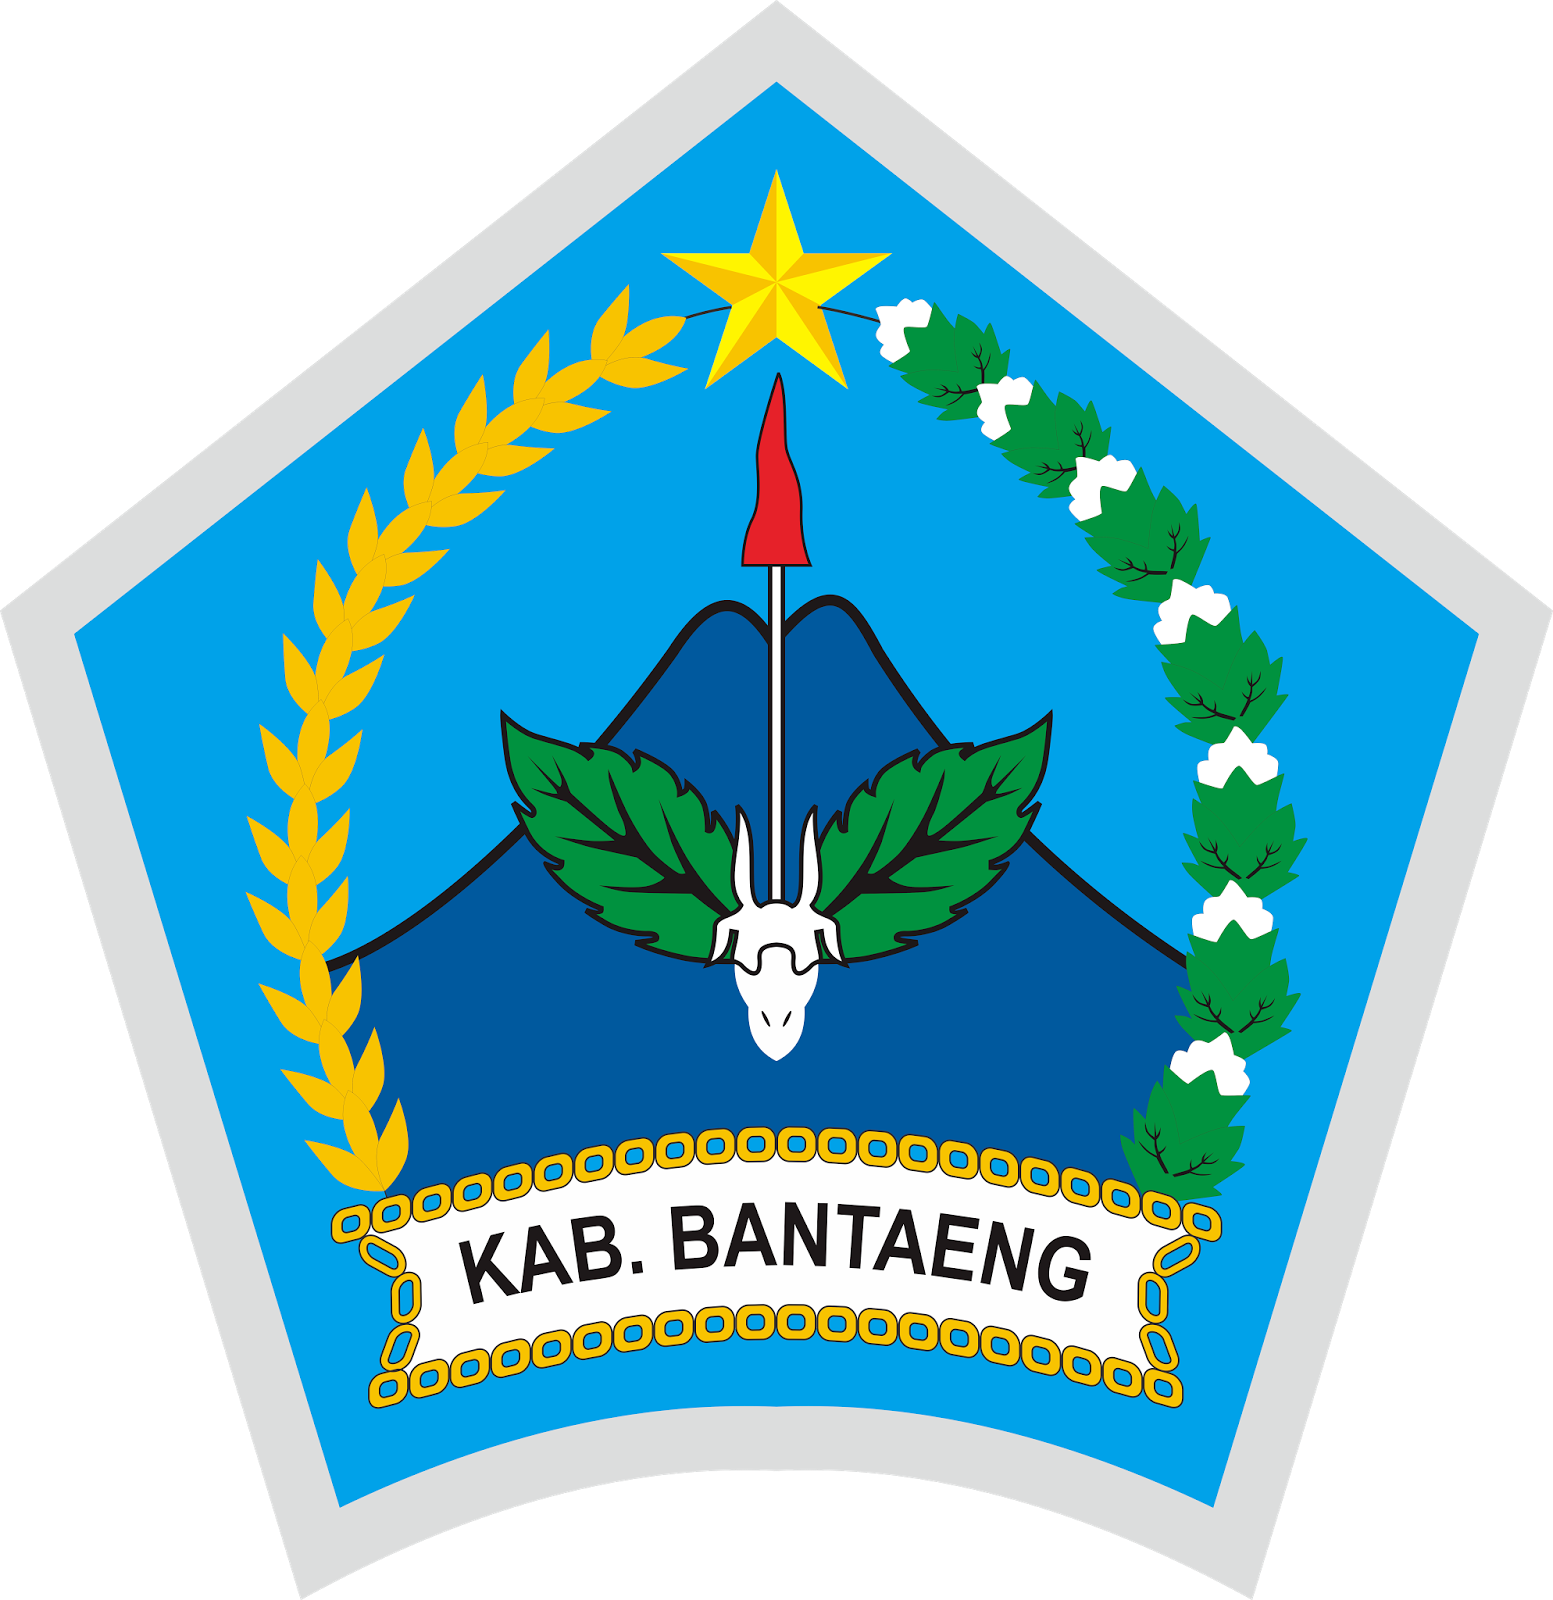 Logo Kabupaten Bantaeng Dan Maknanya Vector File Cdr Coreldraw Logo Vector